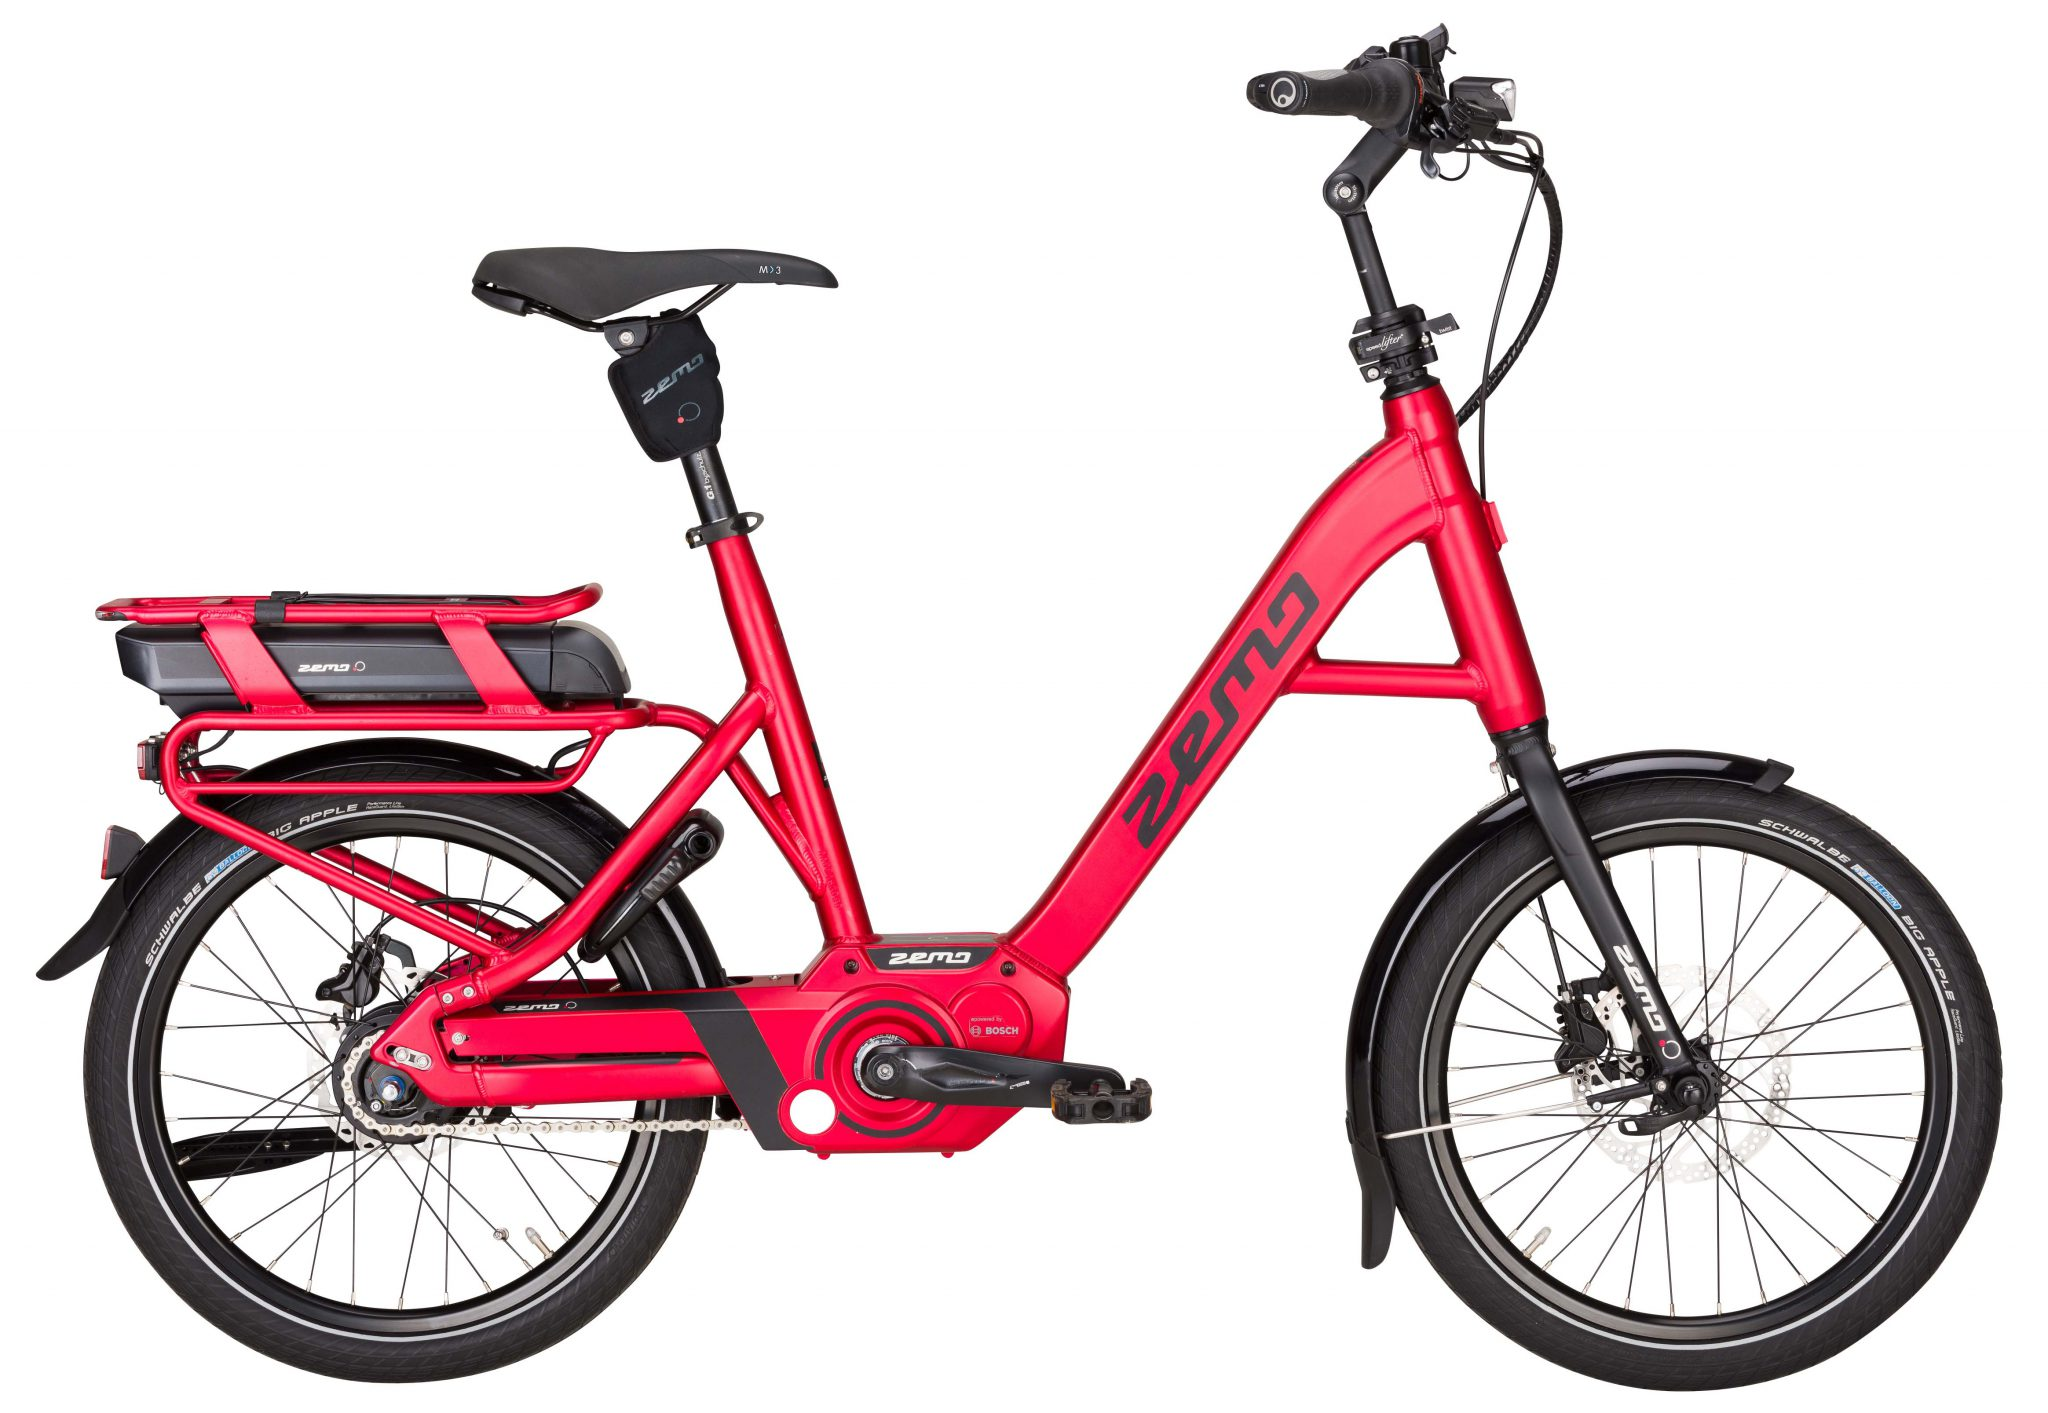 Bici elettrica Scooter R20 motore Bosch Zemo